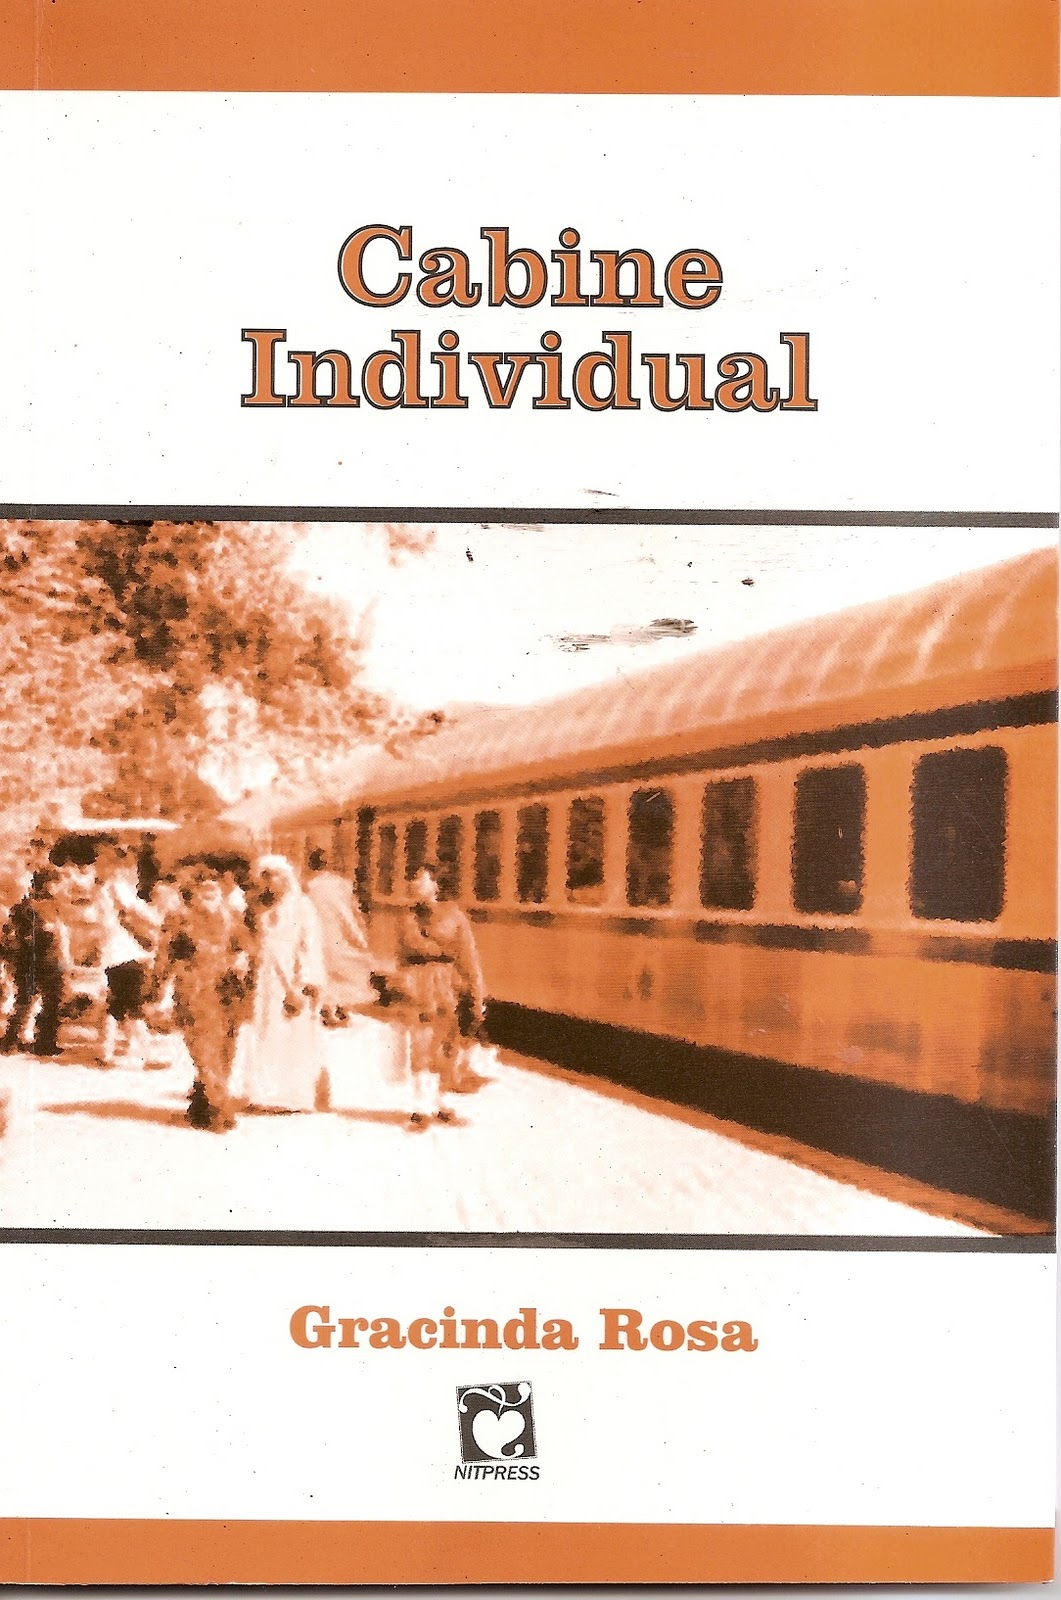 Em Dezembro - Cabine individual: Gracinda Rosa